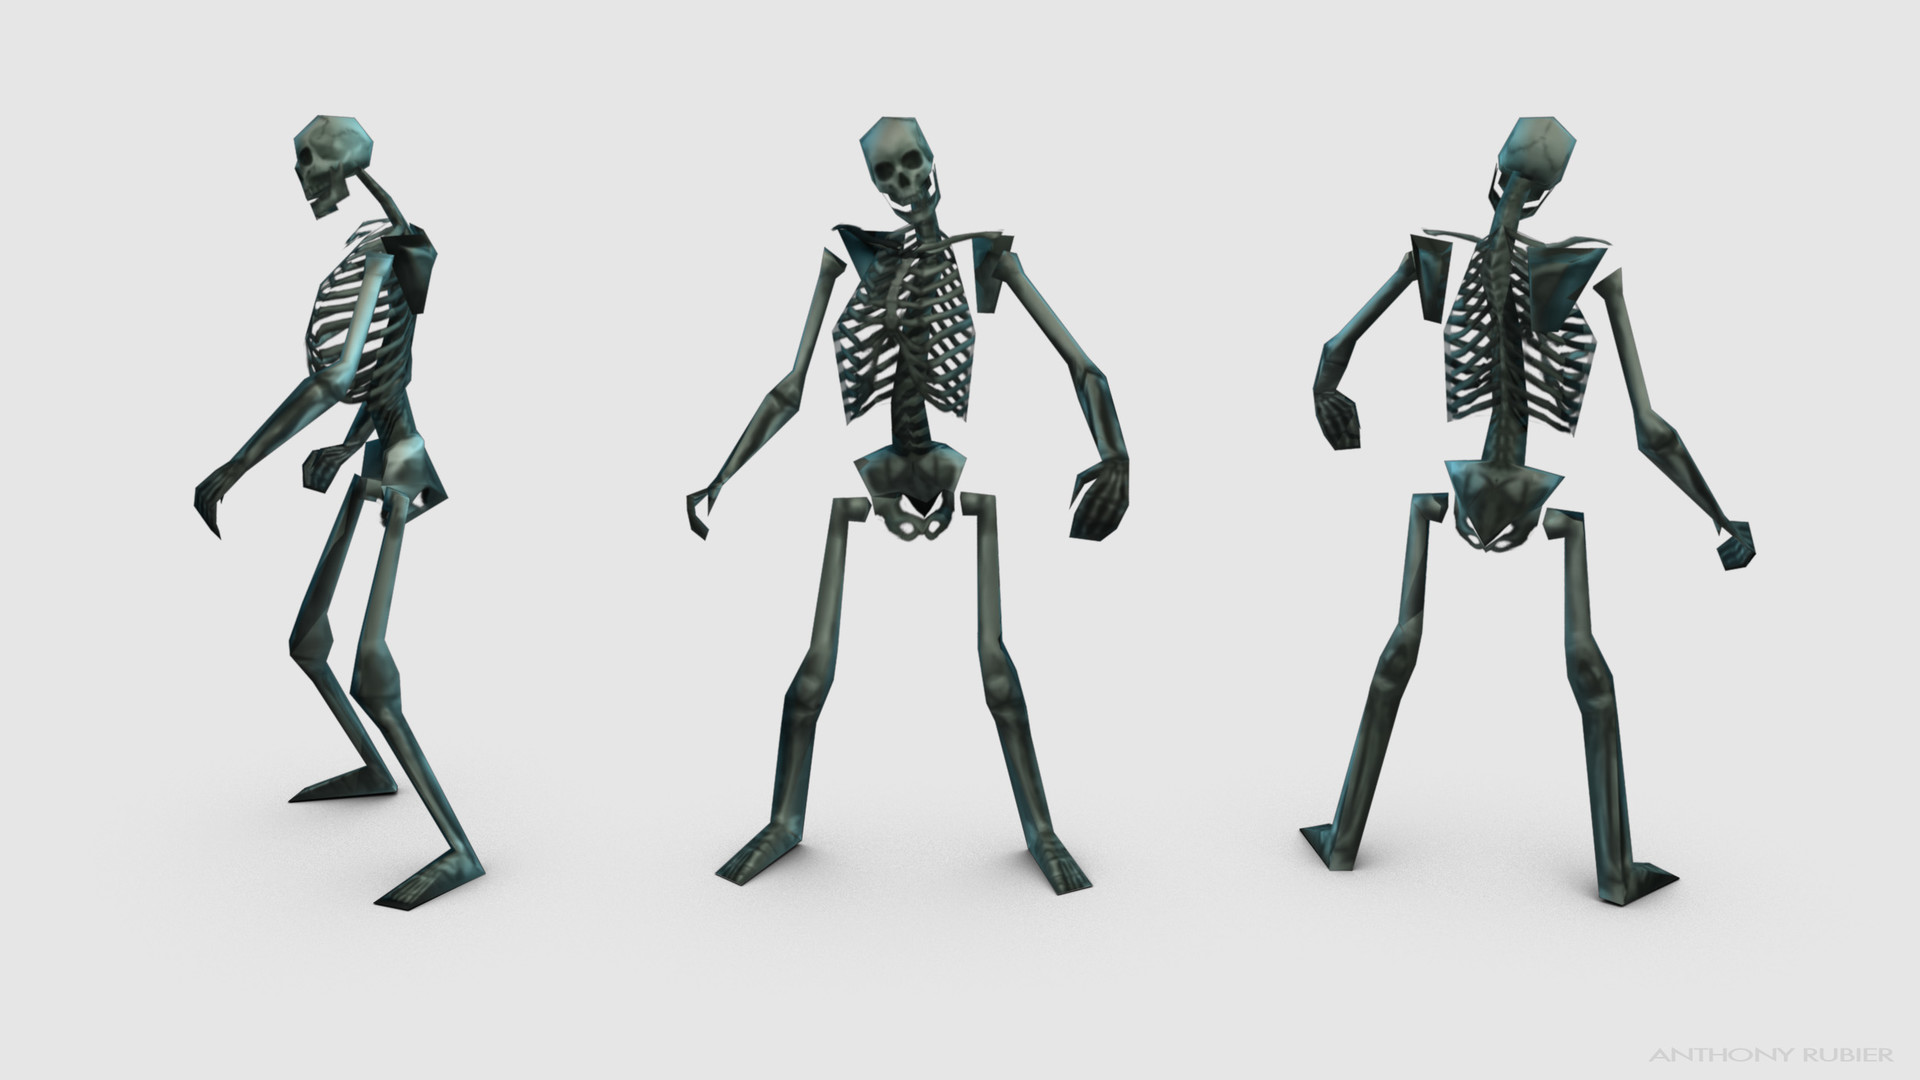 Anthony rubier render mesh squelette 1